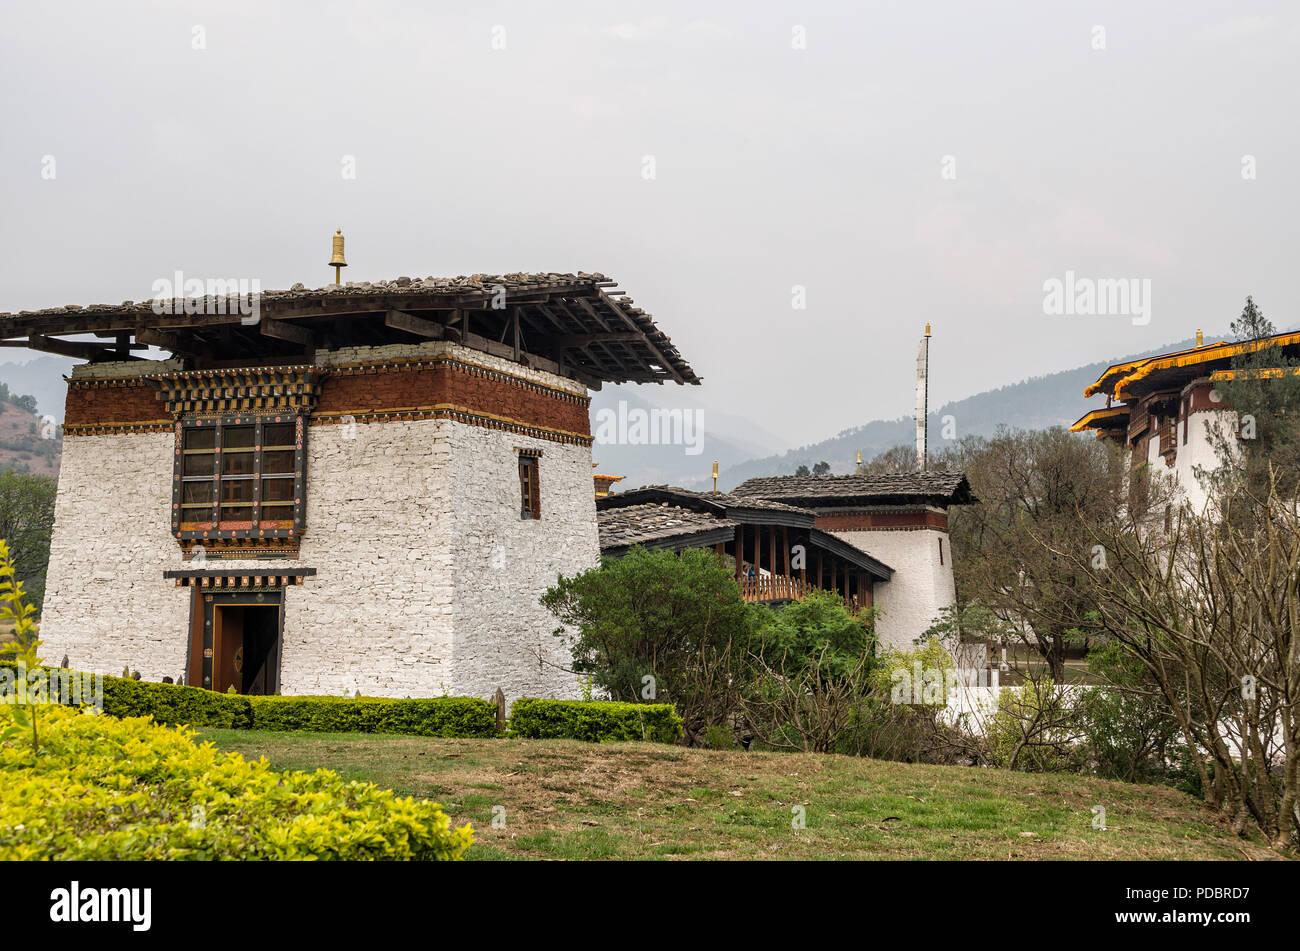 Entrance of Punakha Dzong, Bhutan - Punakha Dzong or Pungthang Dewachen Phodrang (Palace of Great Happiness) in Punakha, the old capital of Bhutan. - Stock Image